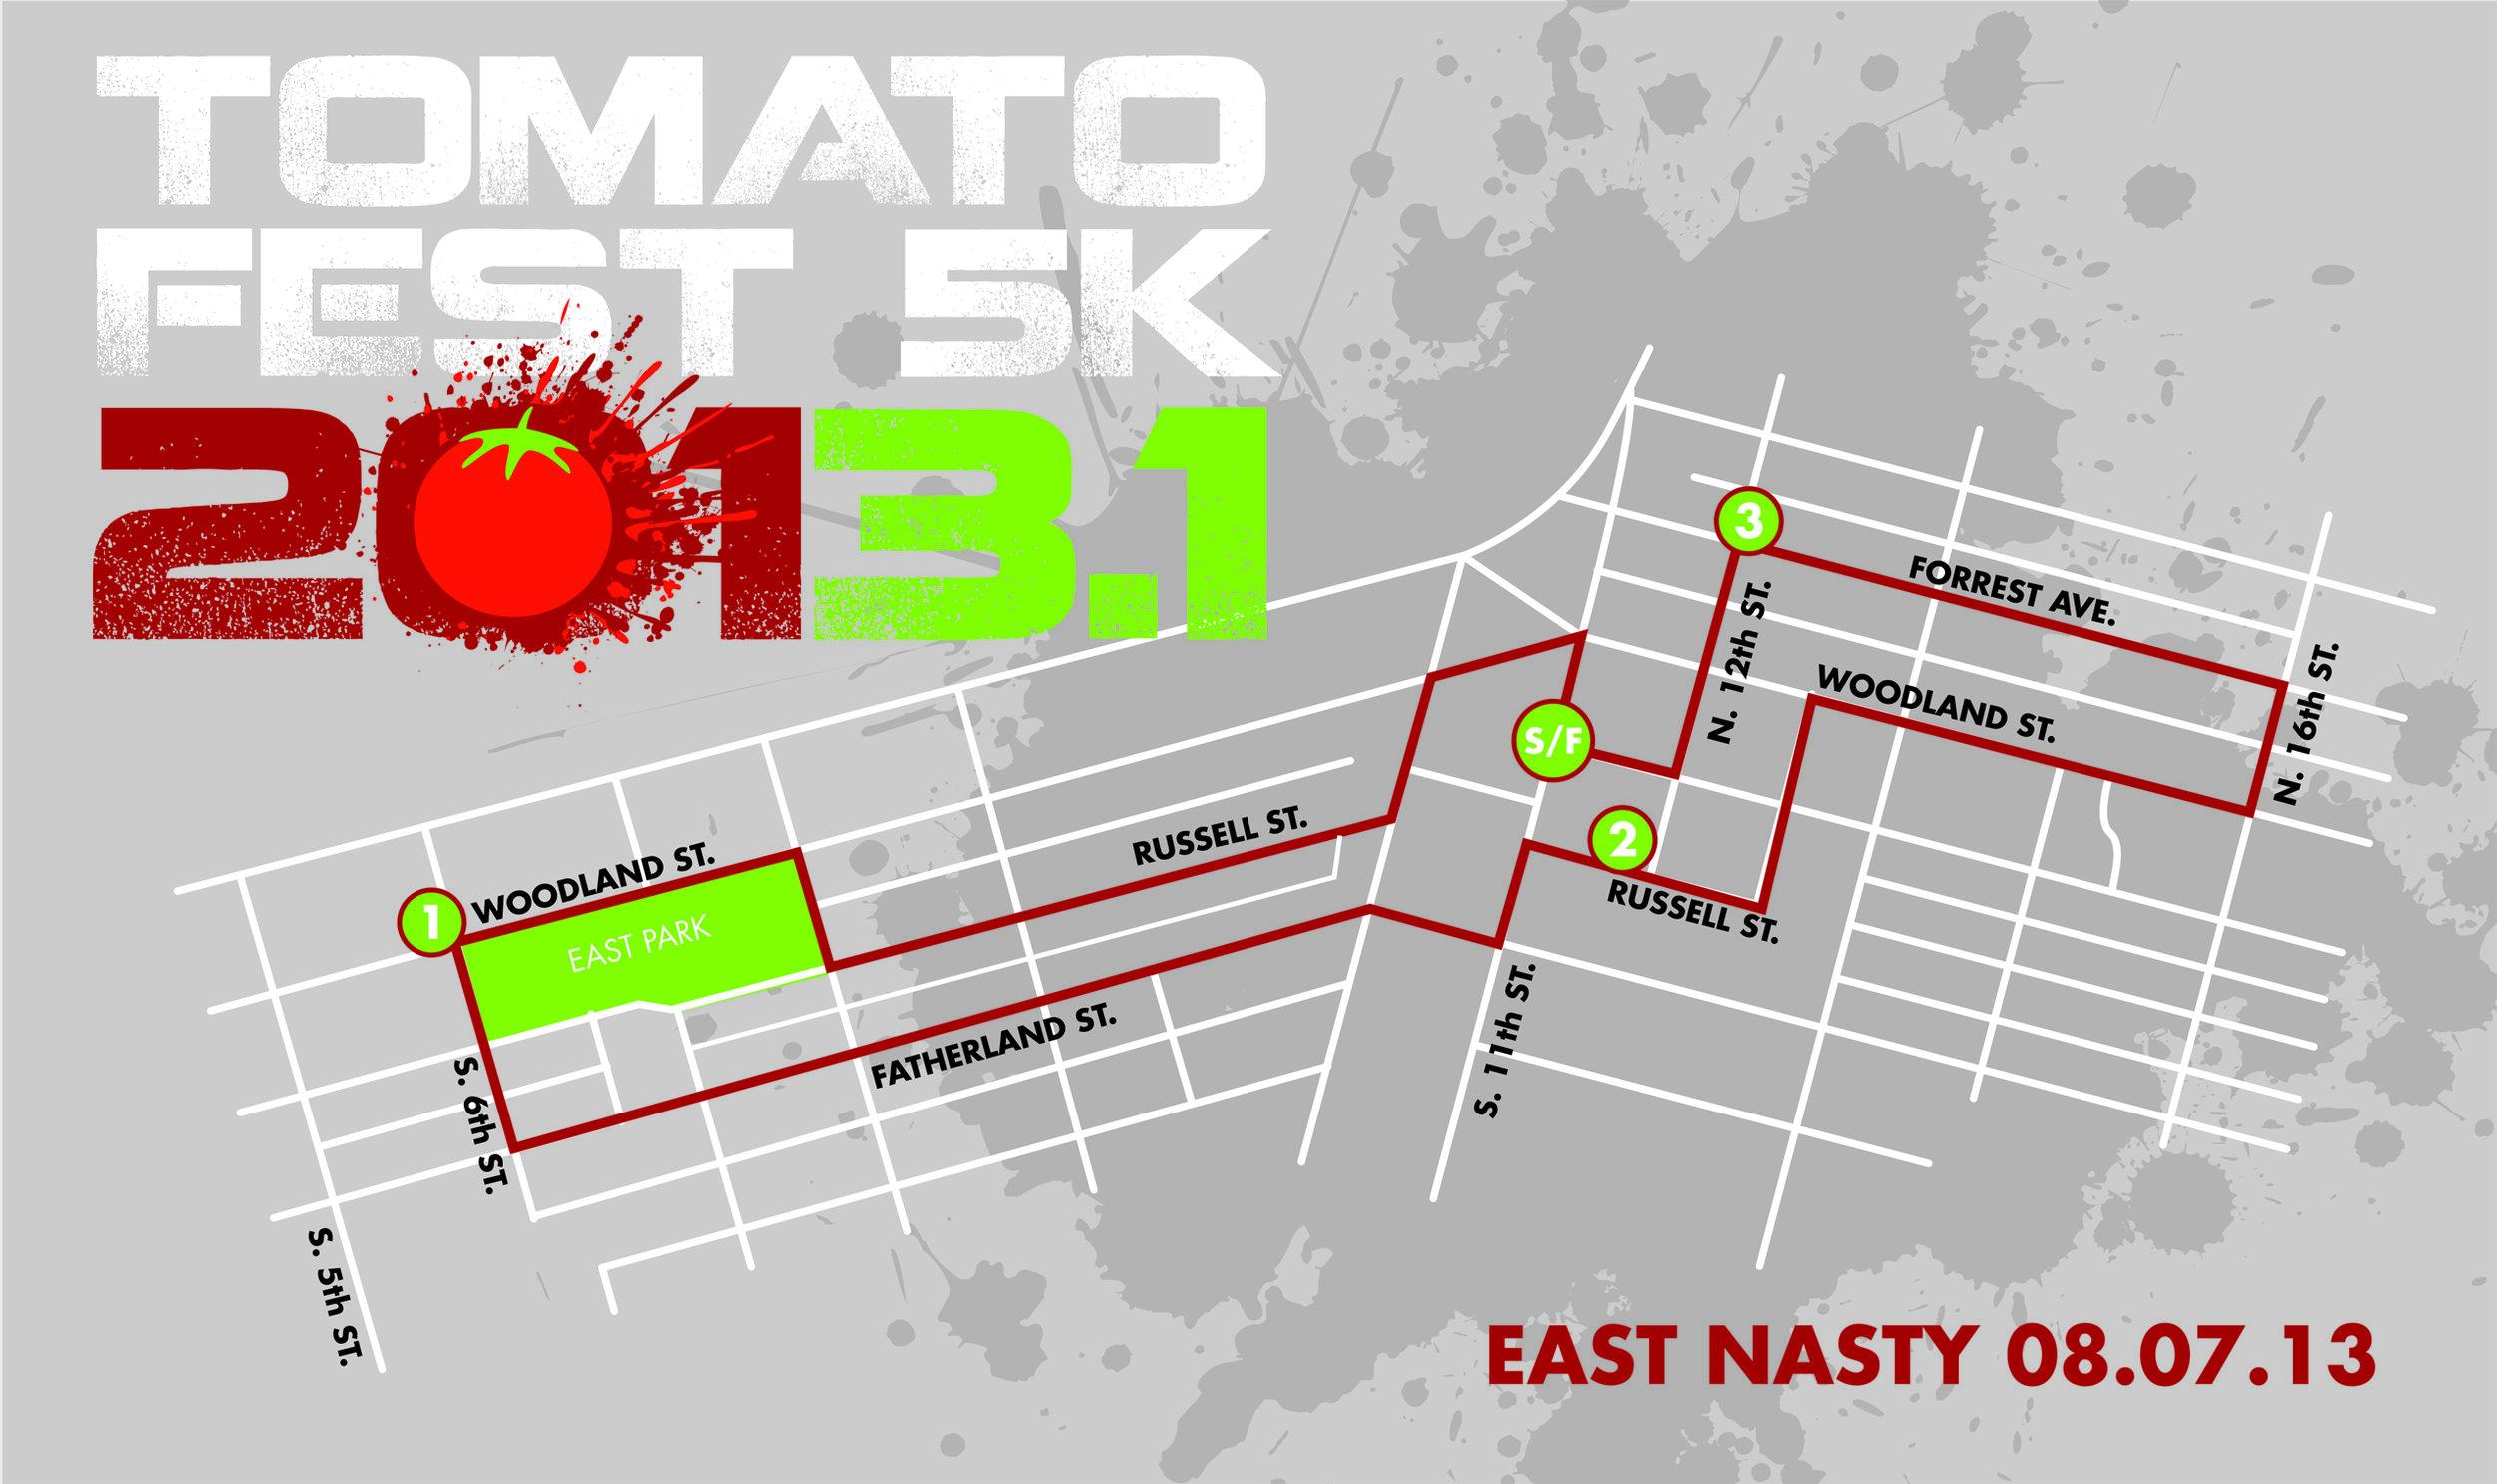 Tomato Route